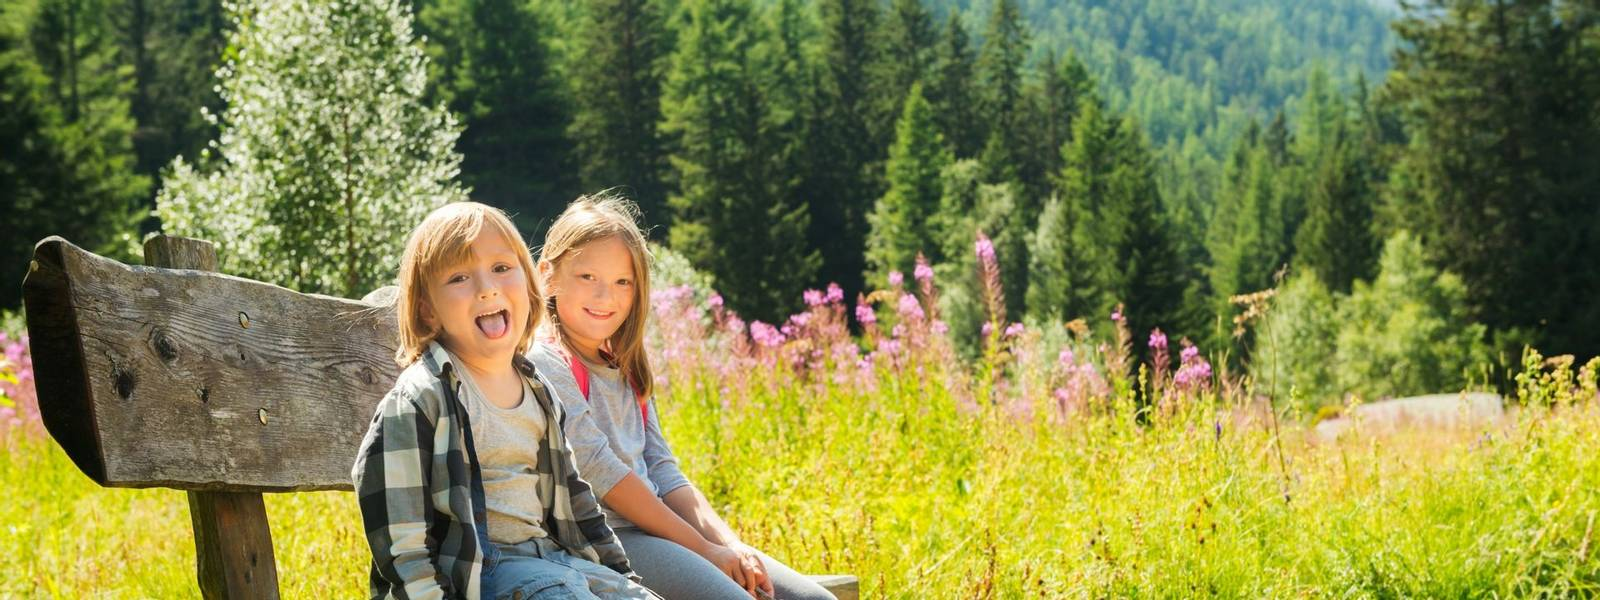 Family-Mayrhofen-AdobeStock_89020092.jpeg